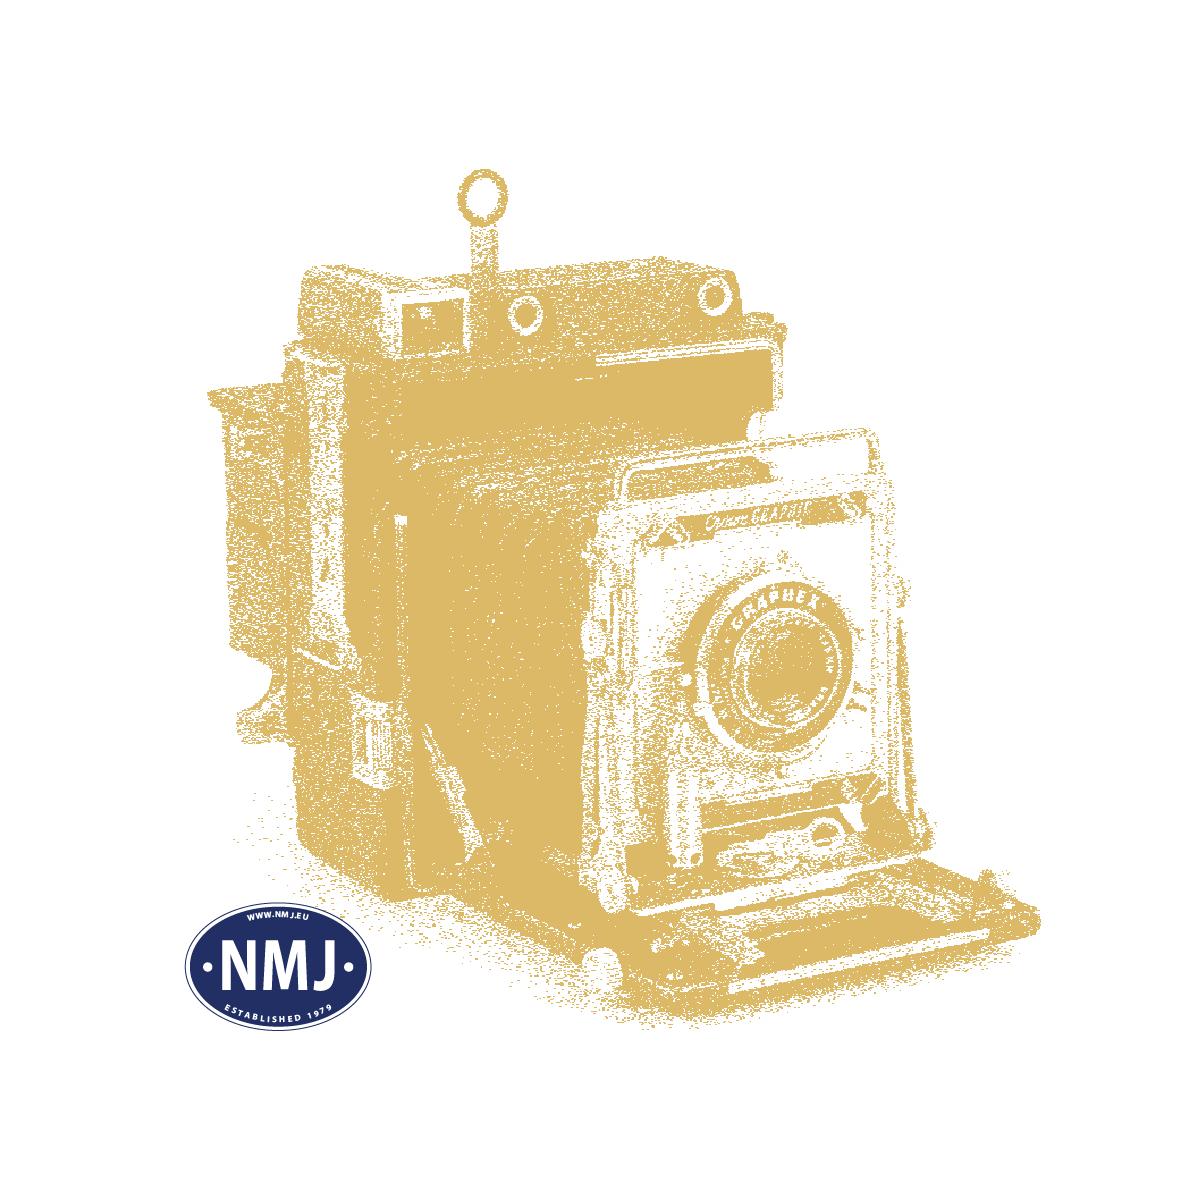 NMJB1139 - Norske Militære Registeringsnummer, 1/35, 1/48, 1/72 og 1/87 (H0)